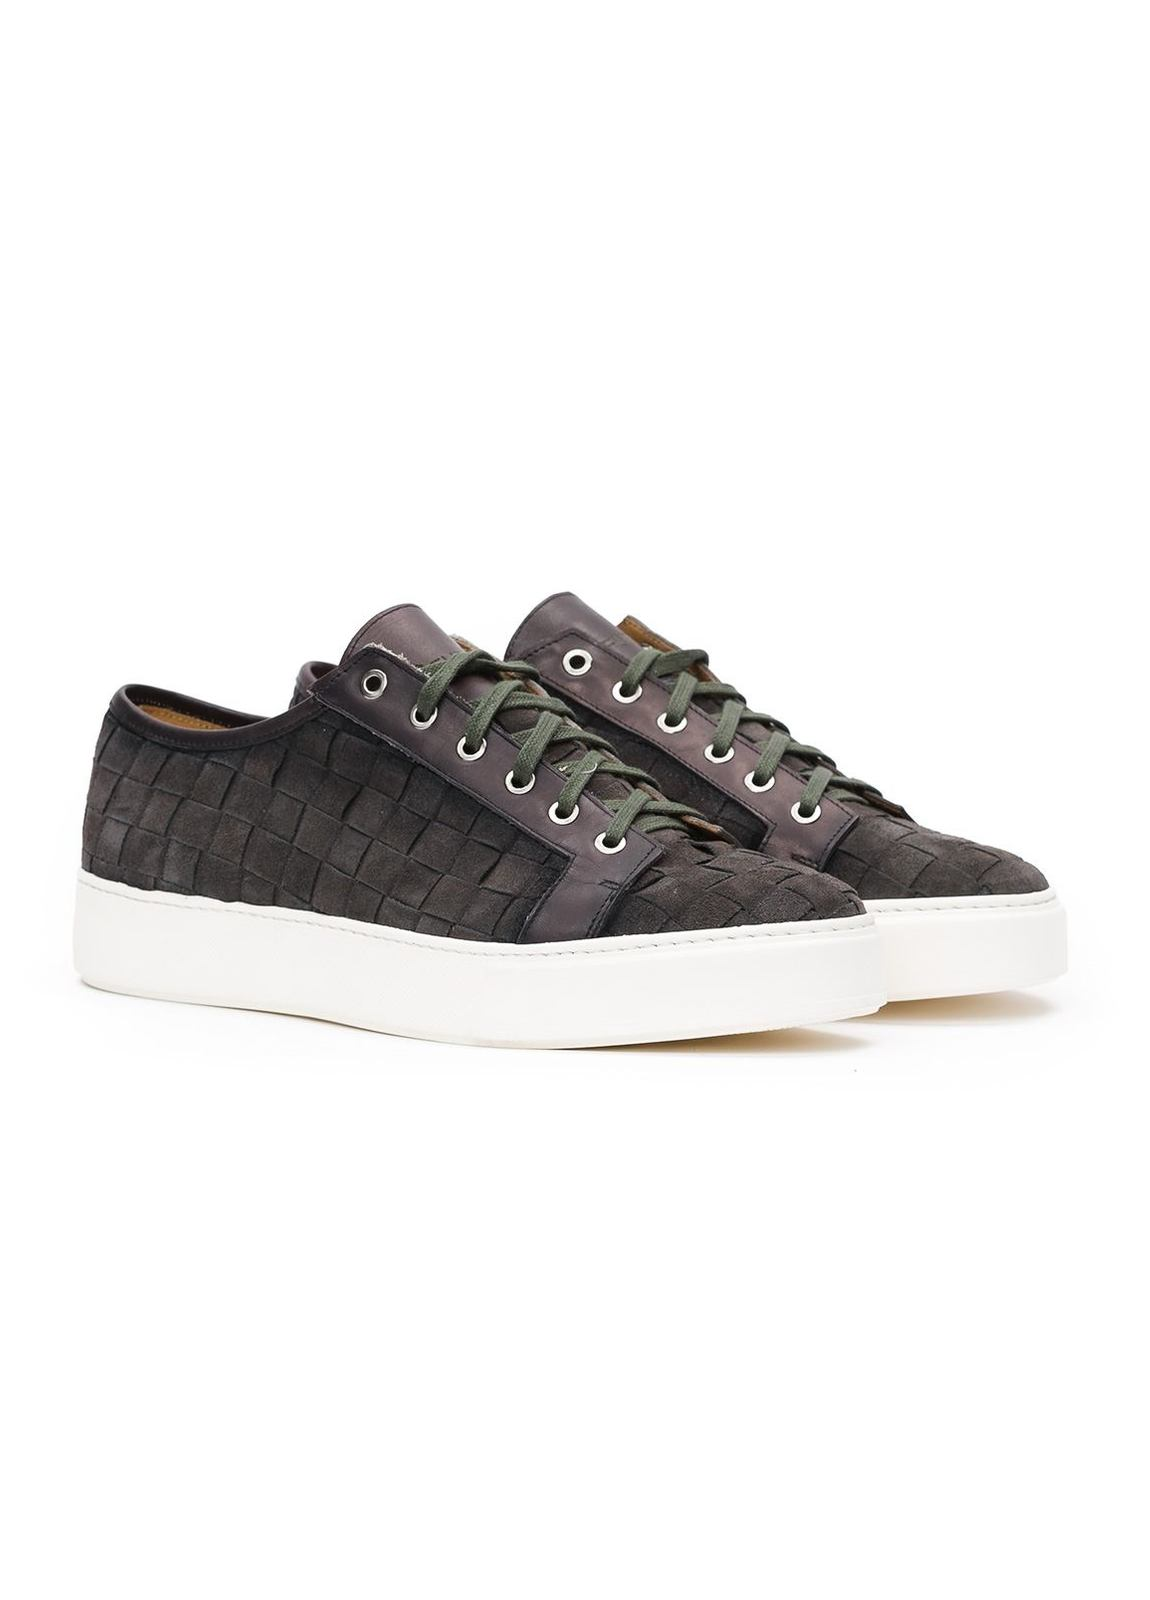 Zapato Sport Wear color gris, 100% Serraje. - Ítem3